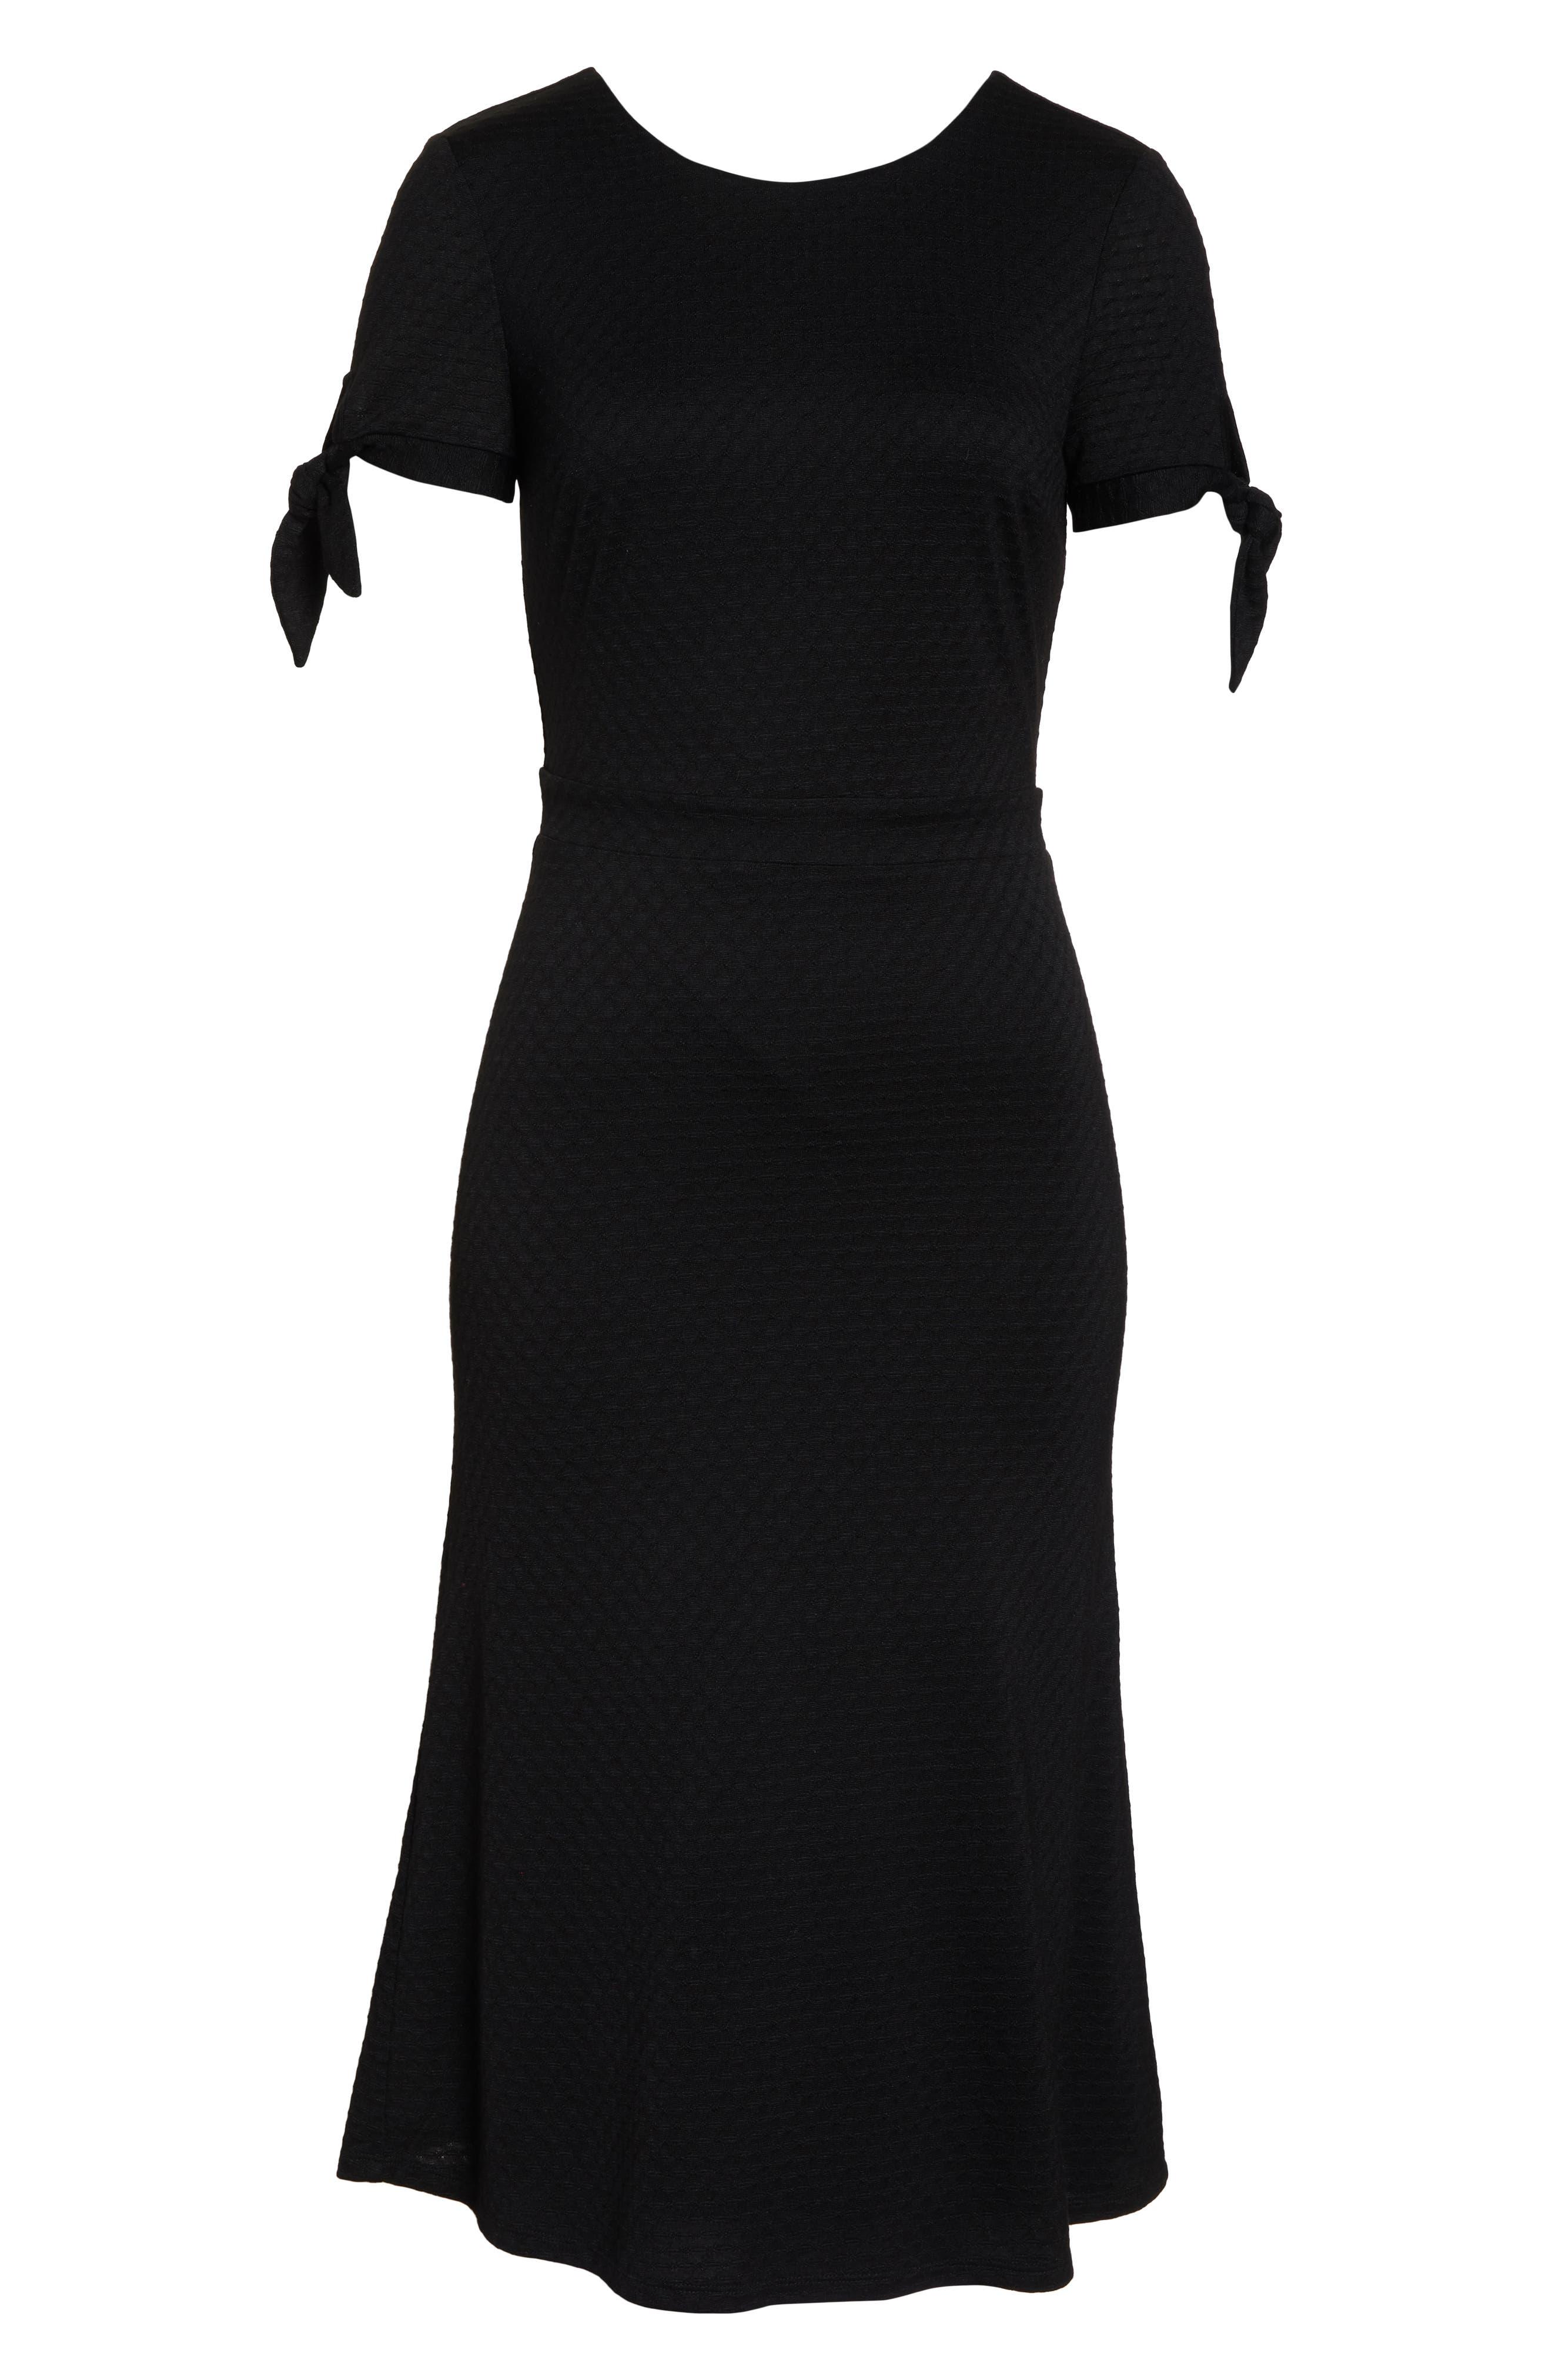 ALI & JAY, Bunker Hill Textured Midi Dress, Alternate thumbnail 7, color, 001